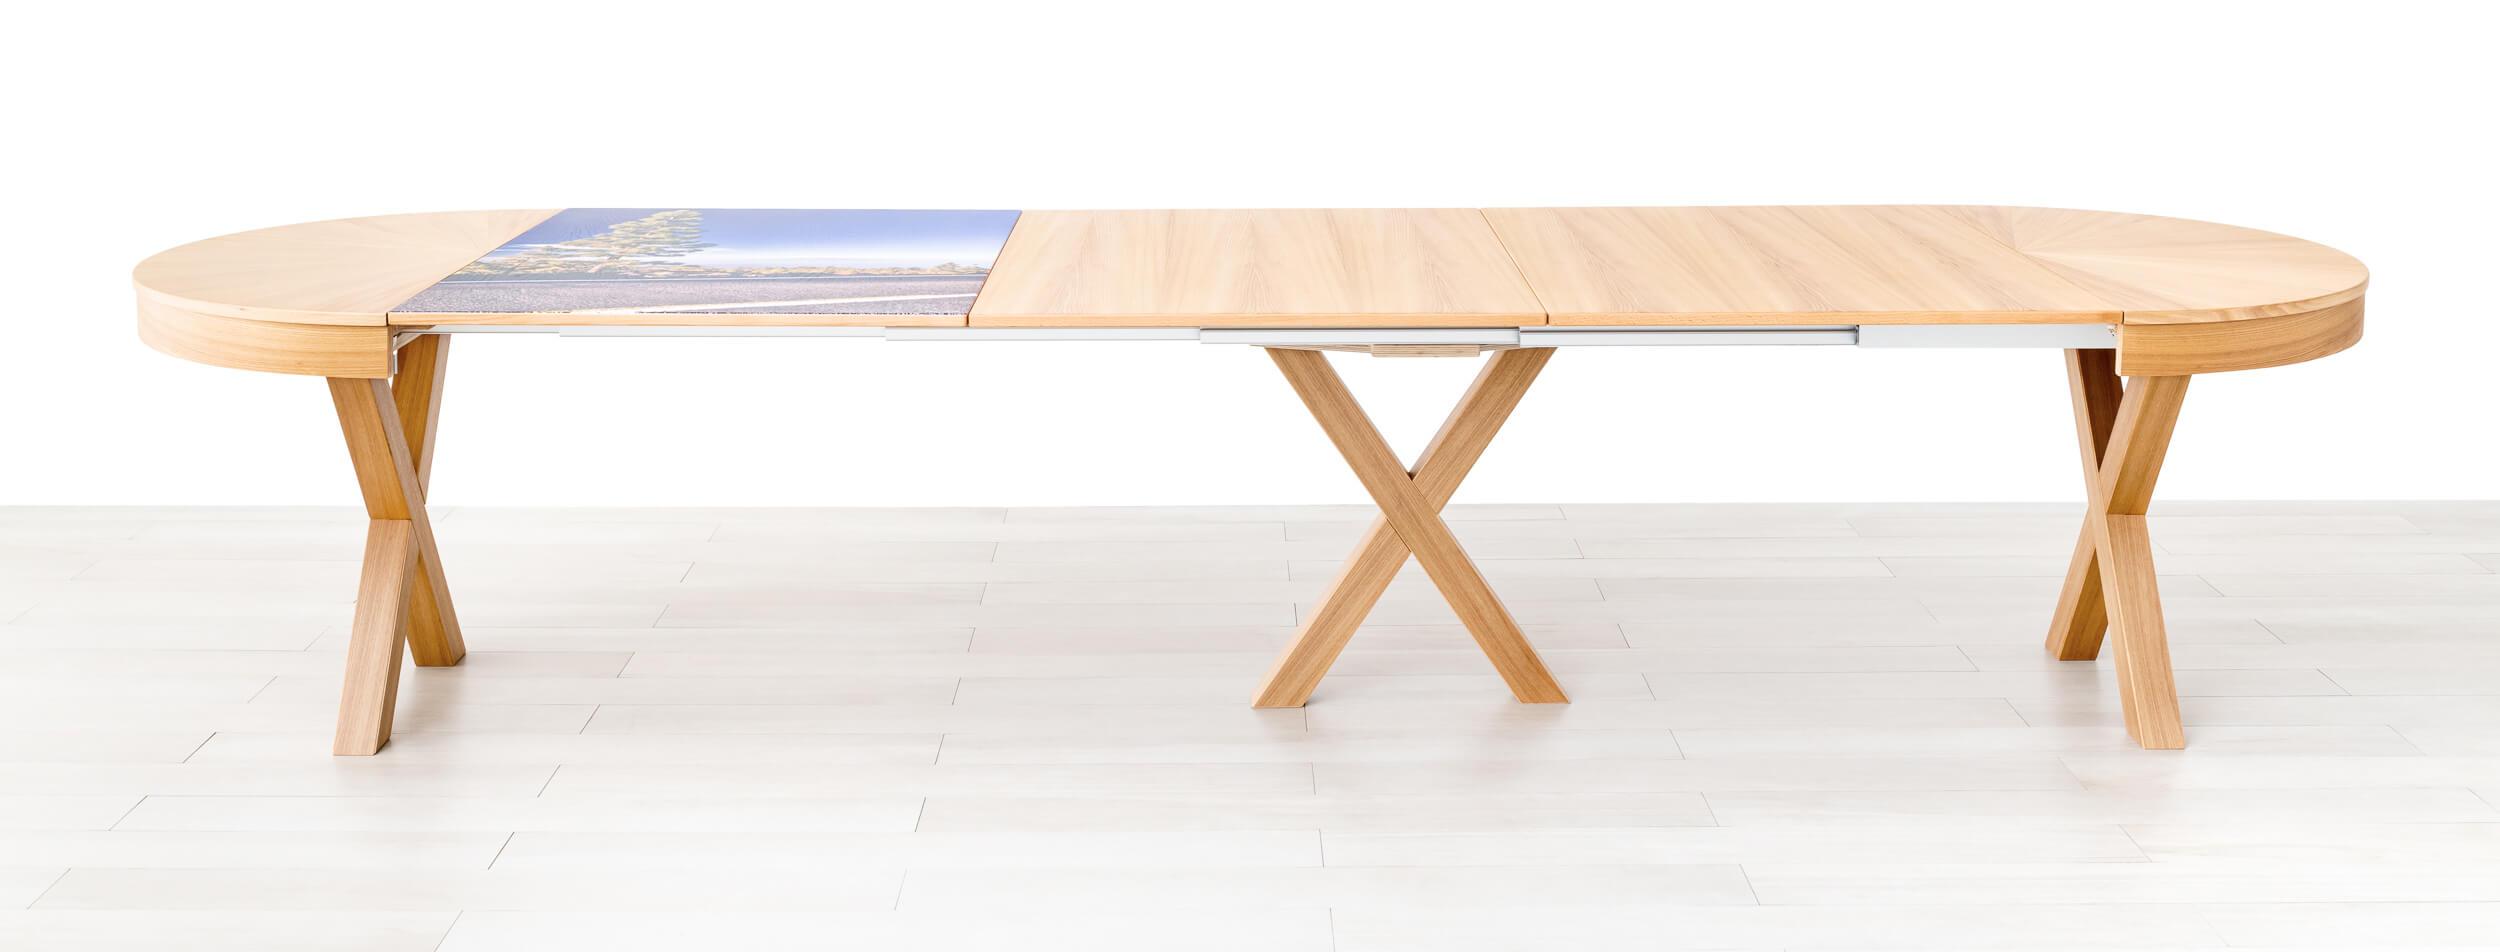 Tavolo rotondo allungabile aperto